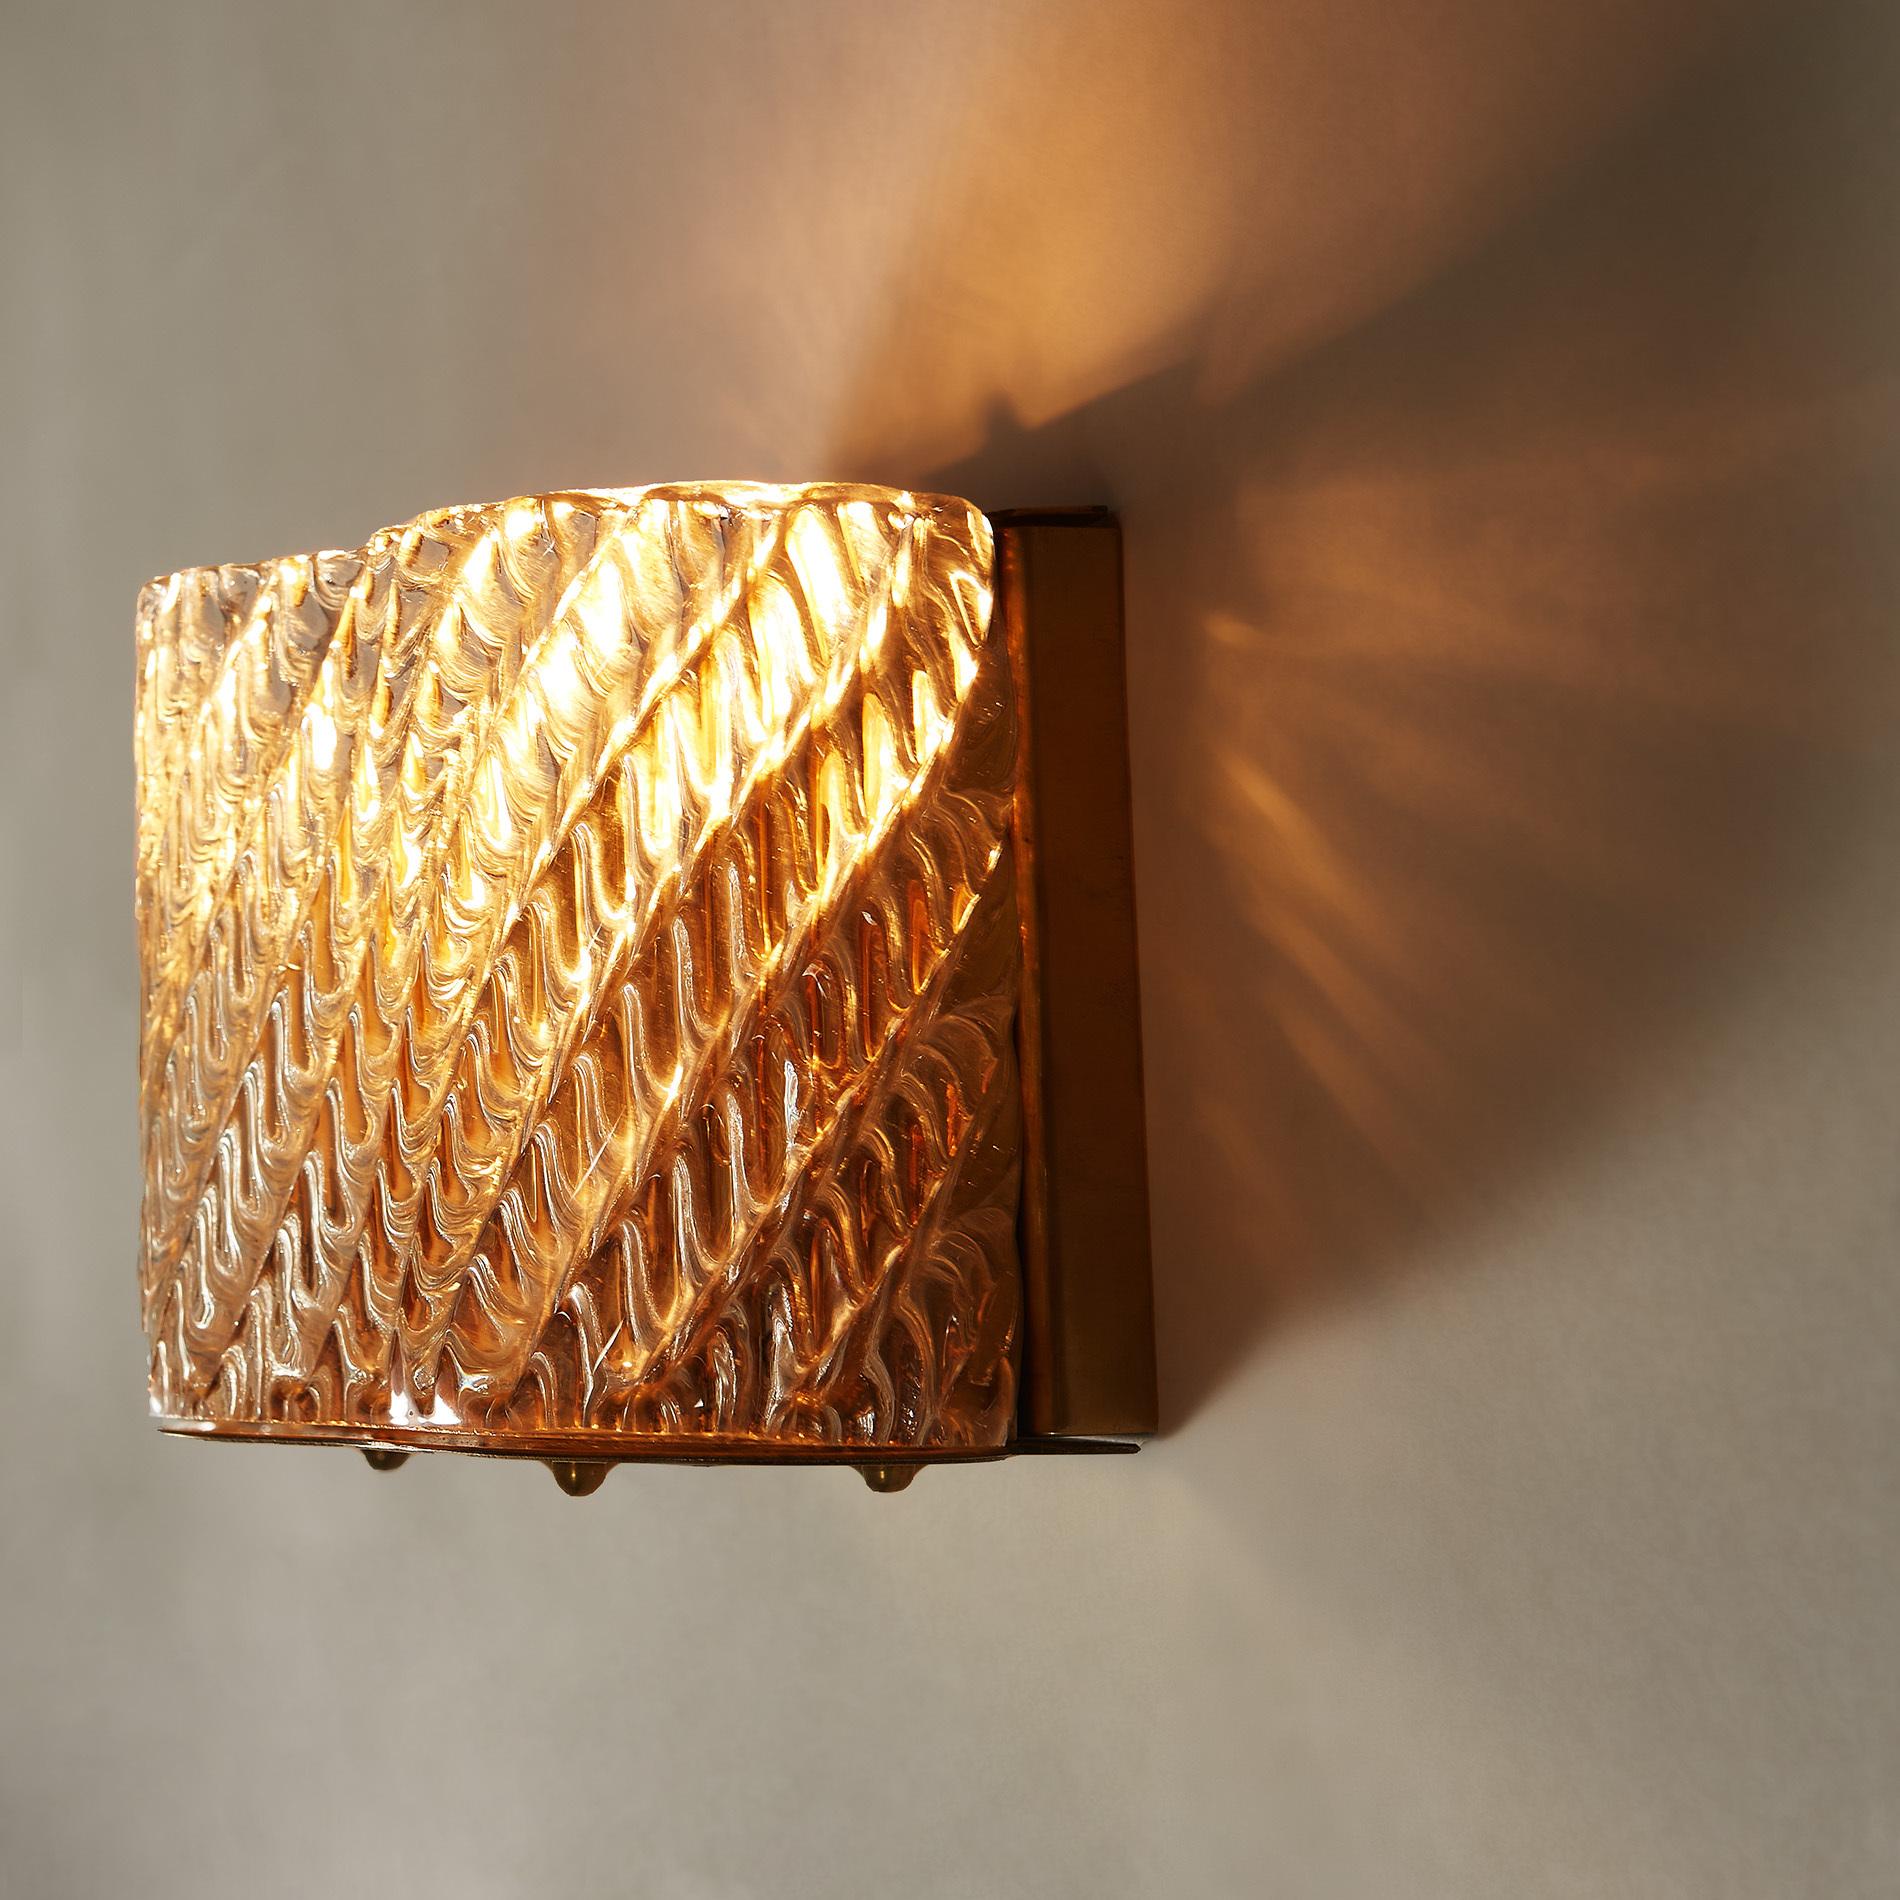 Seguso Diagonal Glass Wall Lights 20210427 Valerie Wade 4 0286 V1